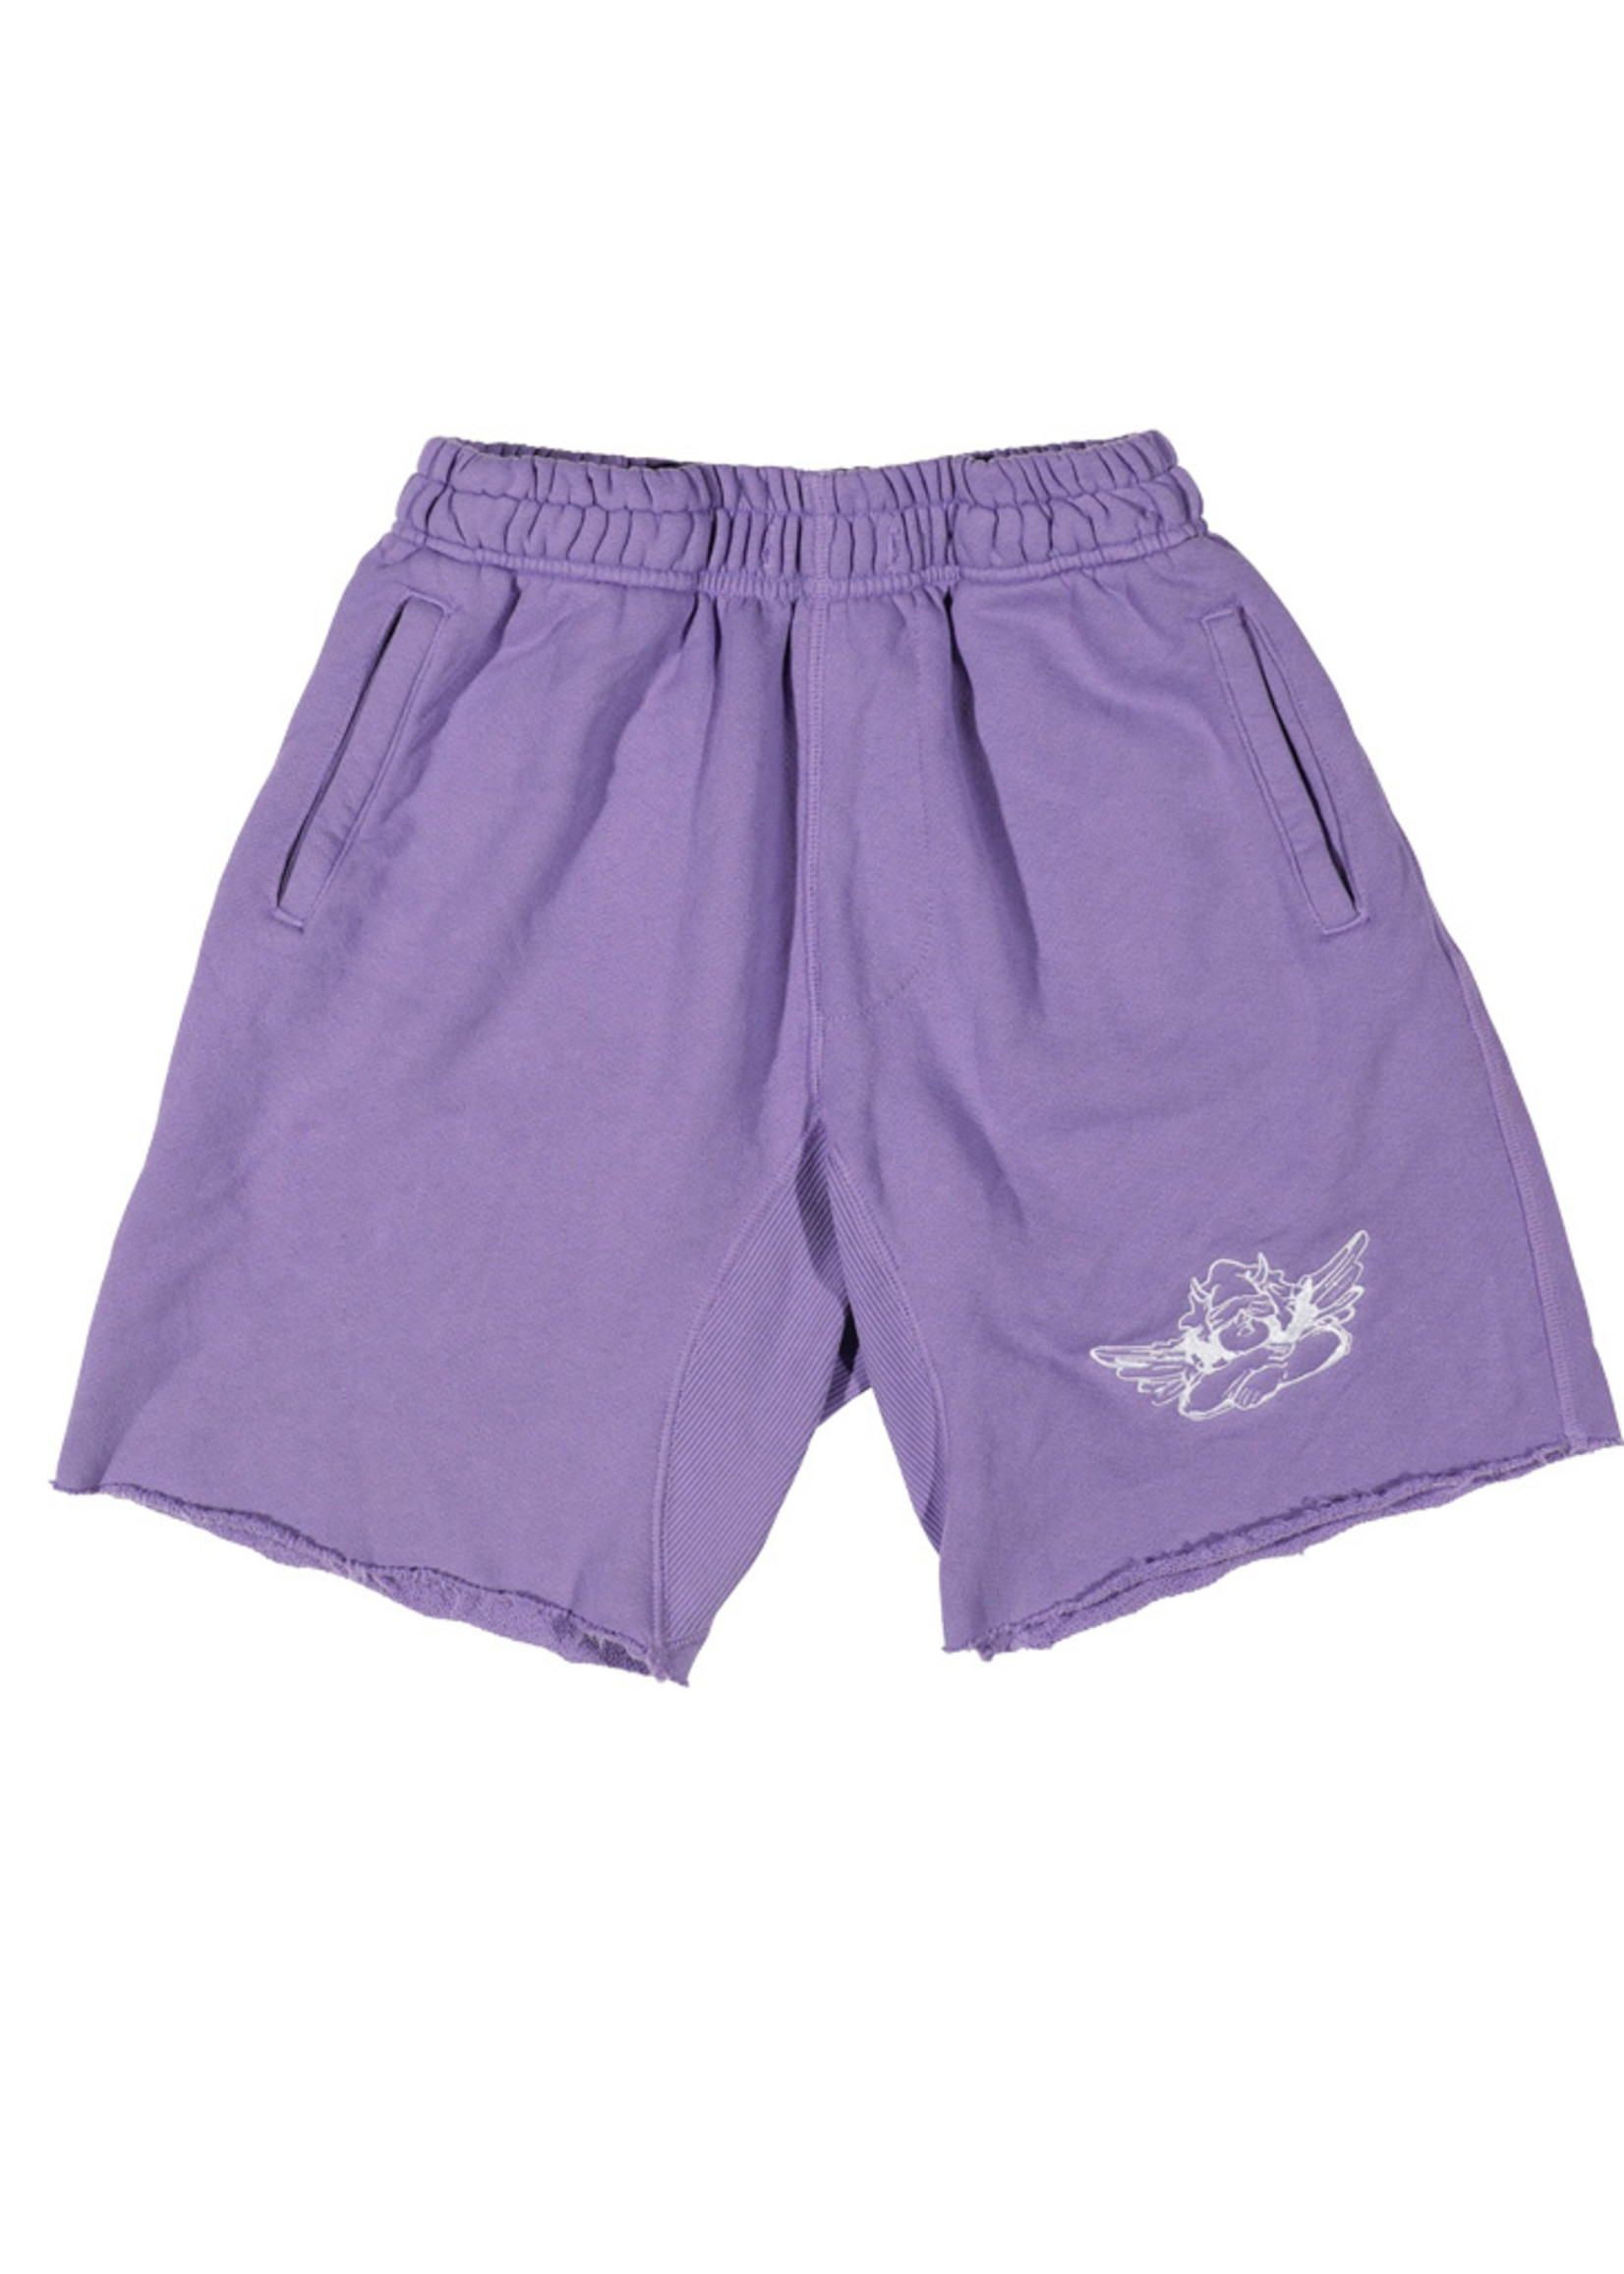 BOYS LIE BOYS LIE / Purple V3 Shorts